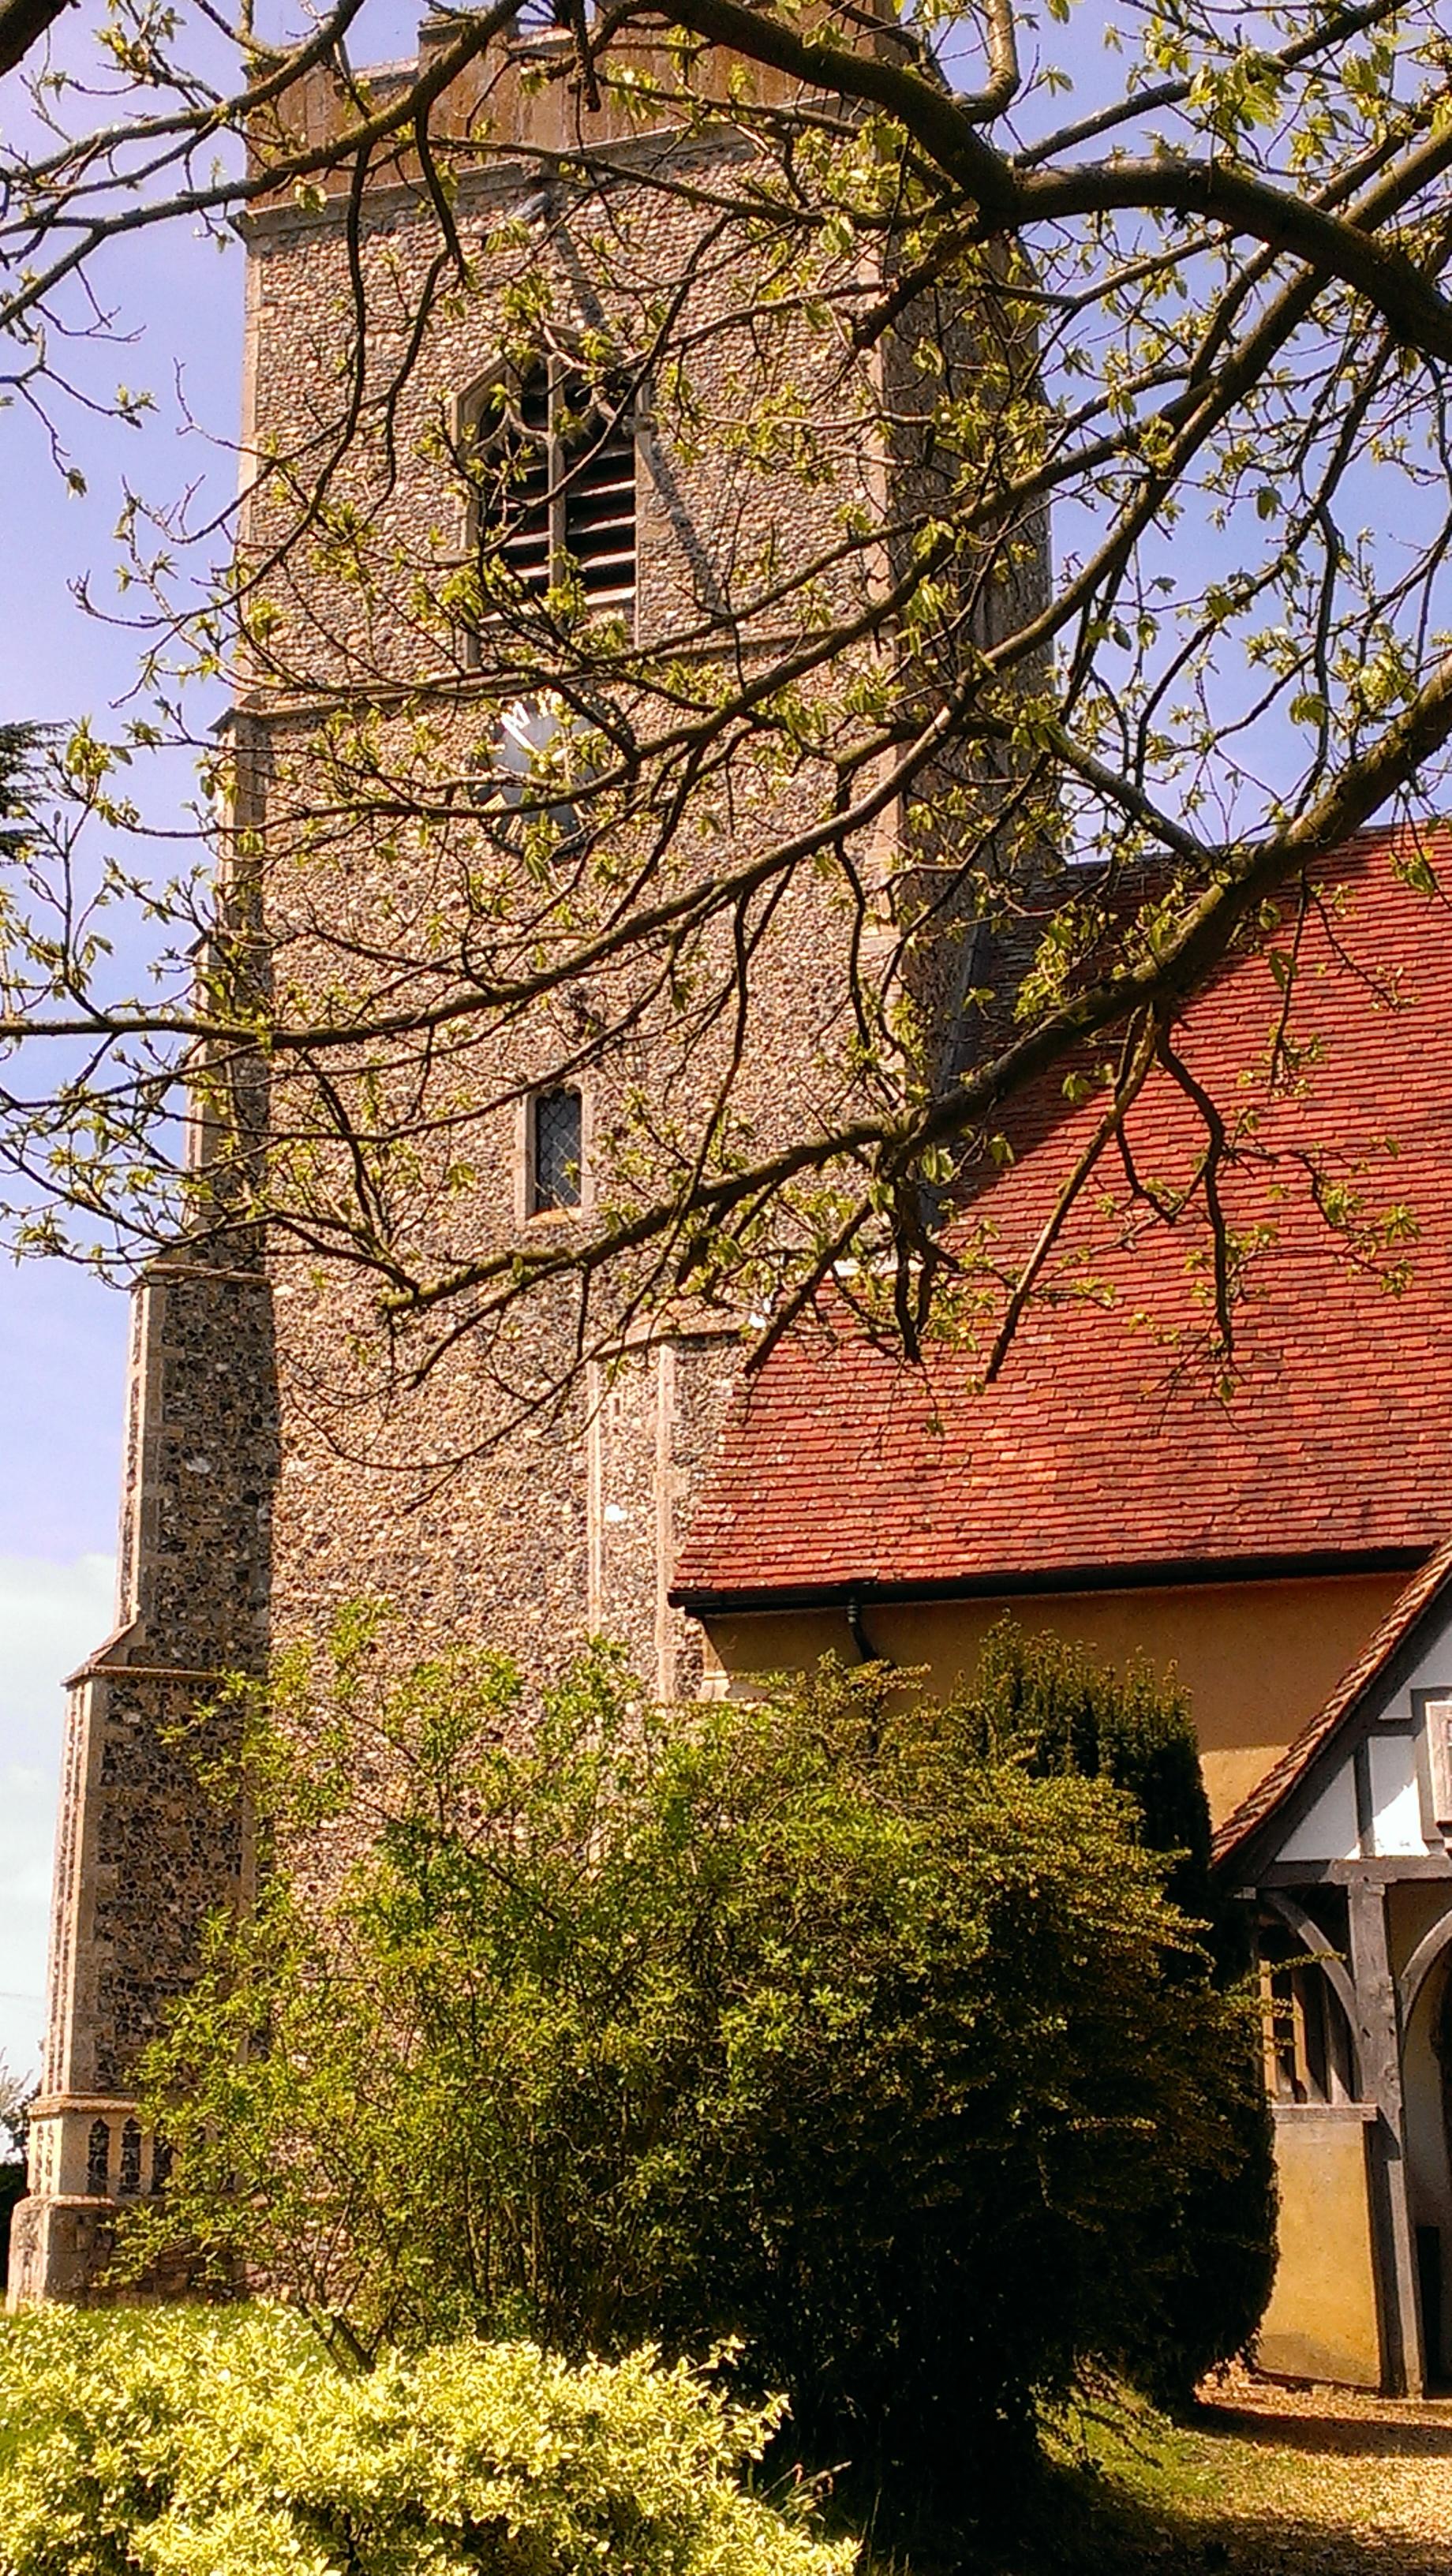 The church at Great Wenham, where Matthew Hopkins was born